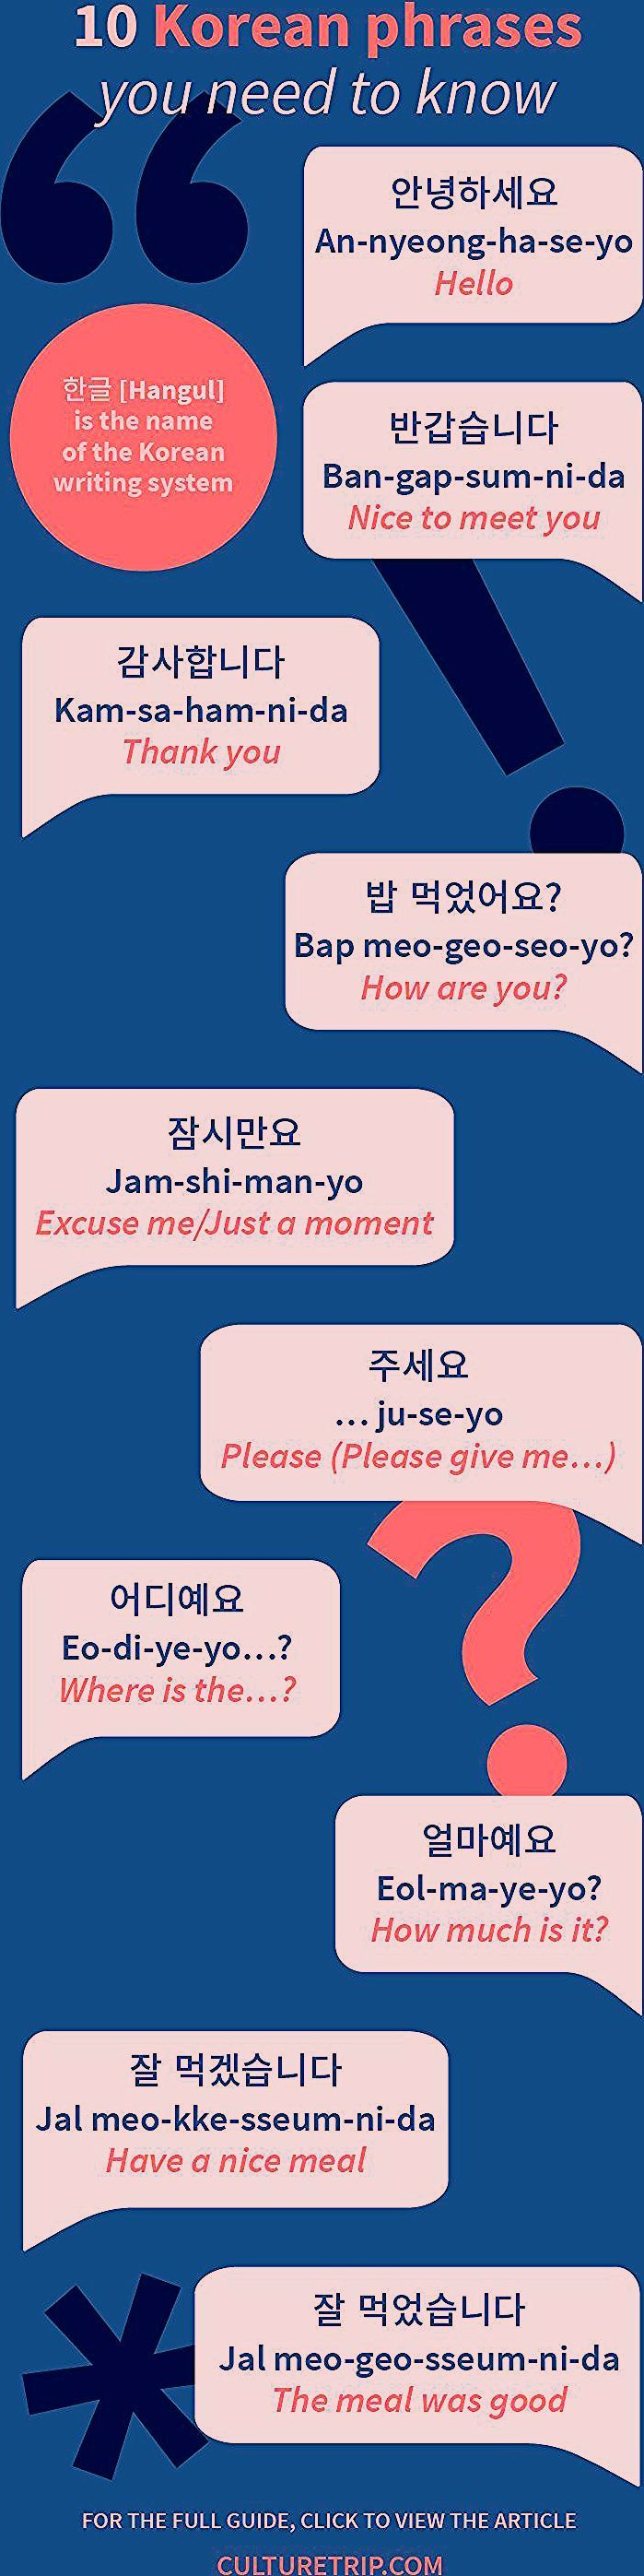 Photo of 15 Korean Phrases You Need to Know